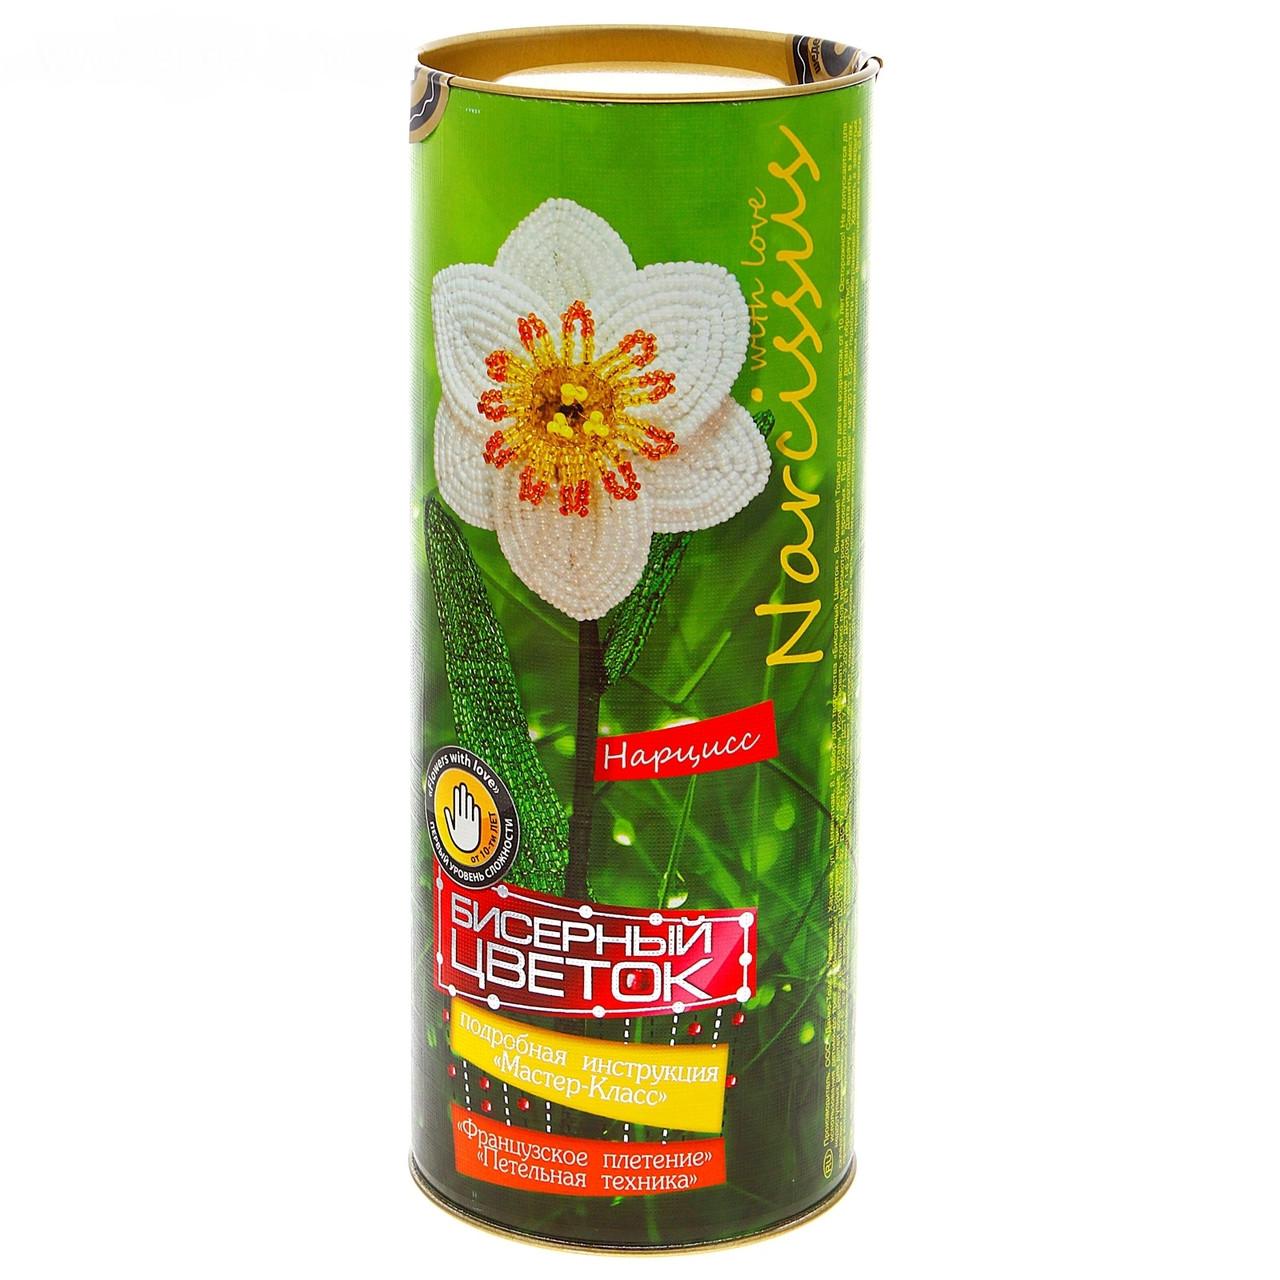 Набор для творчества Бисерный цветок нарцис бисероплитение